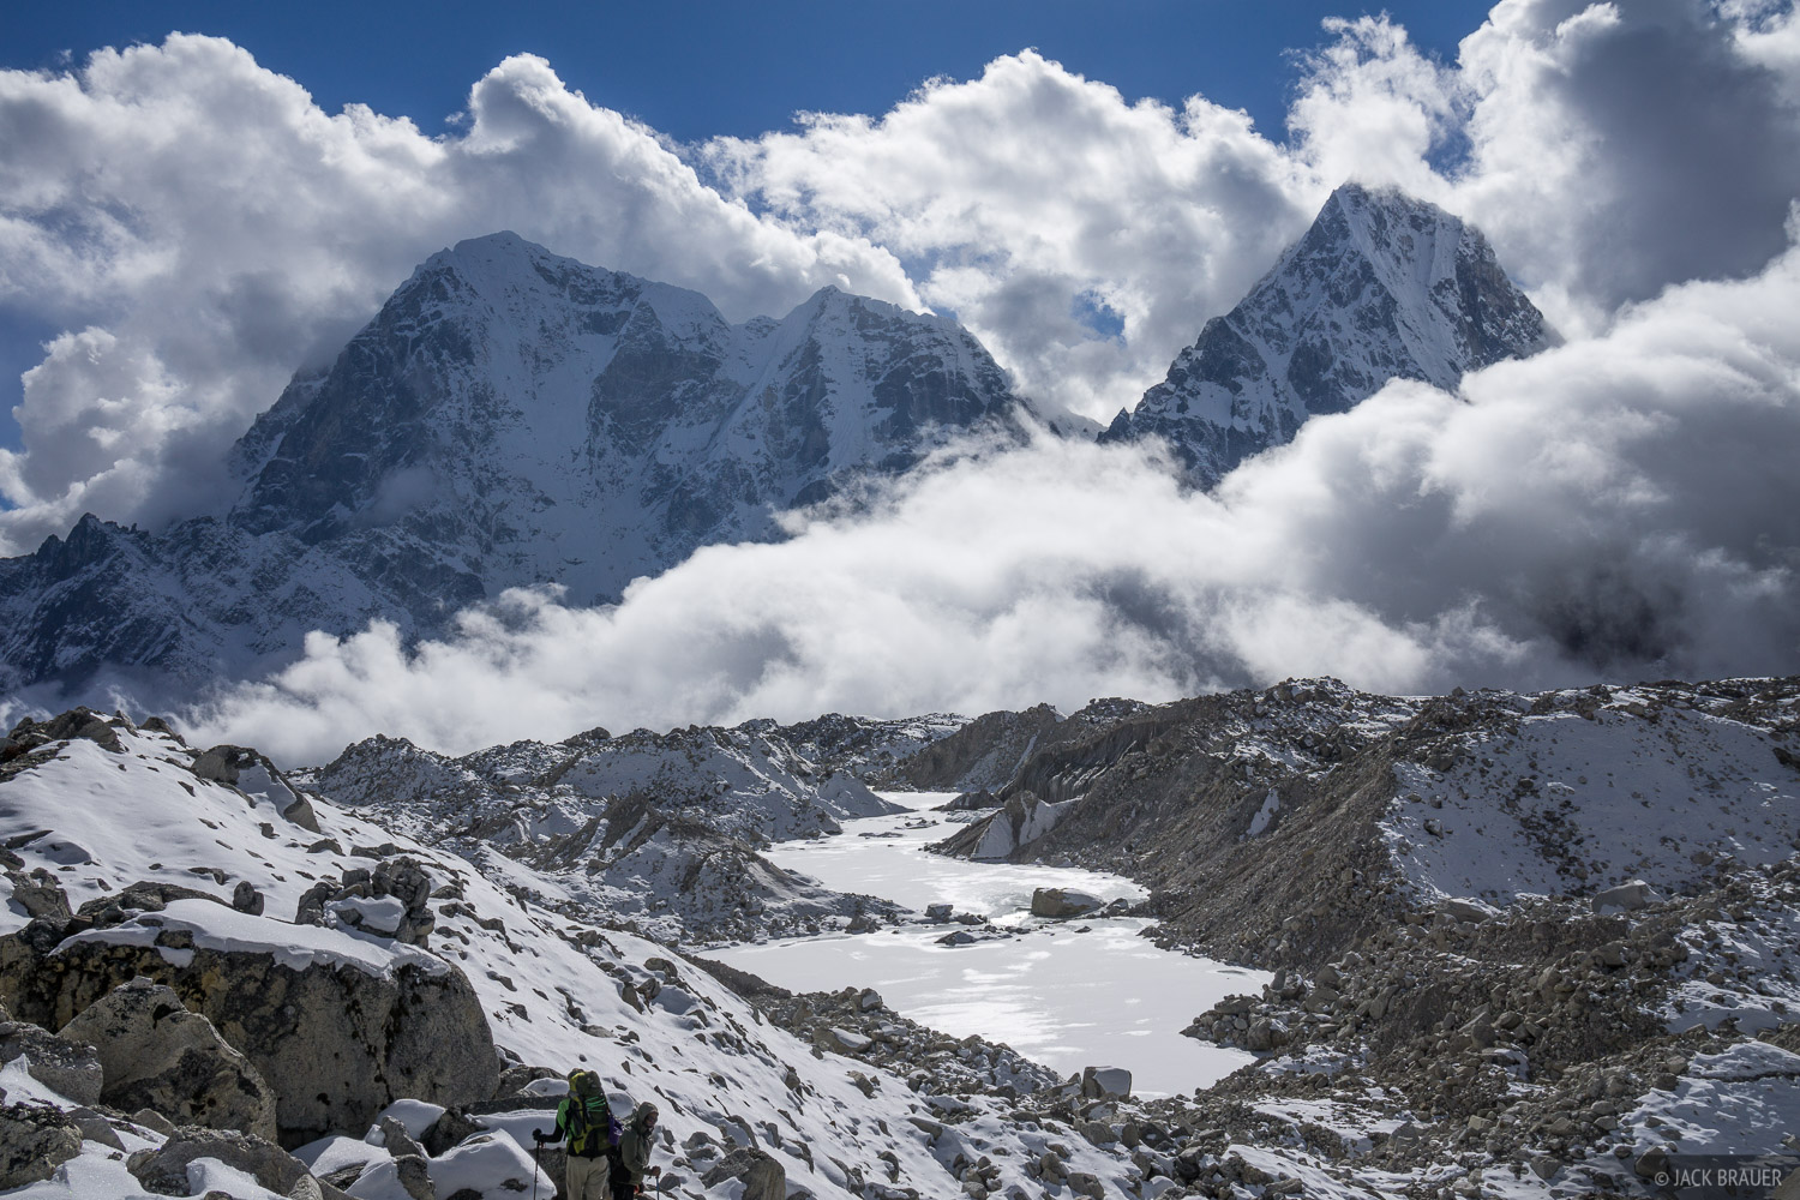 Cholatse,Himalaya,Khumbu,Khumbu Glacier,Nepal,Taboche Peak, photo